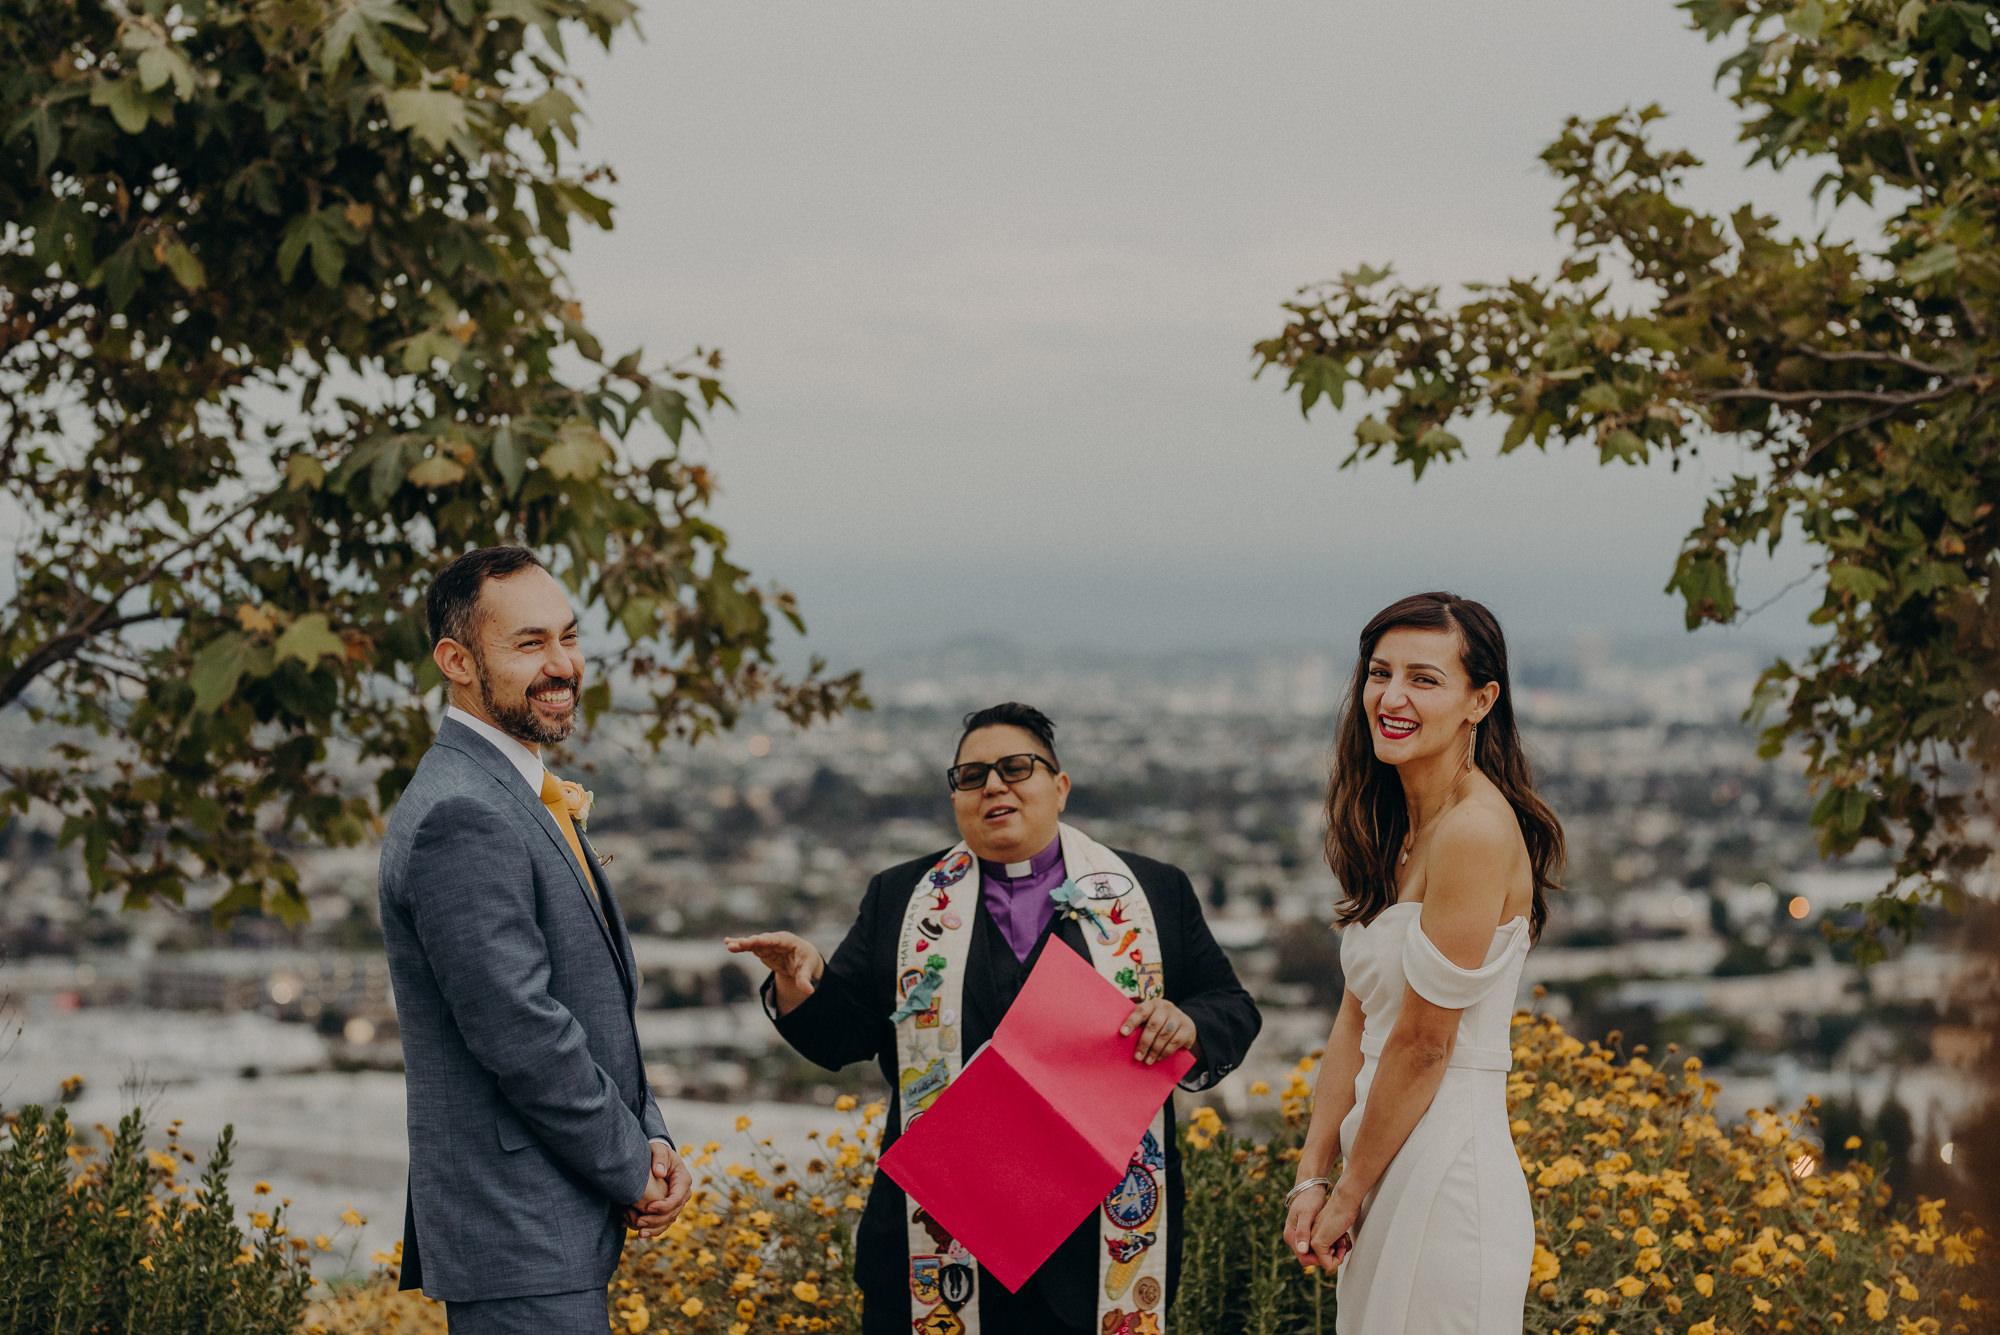 elopement photographer in los angeles - la wedding photographer - isaiahandtaylor.com-067.jpg